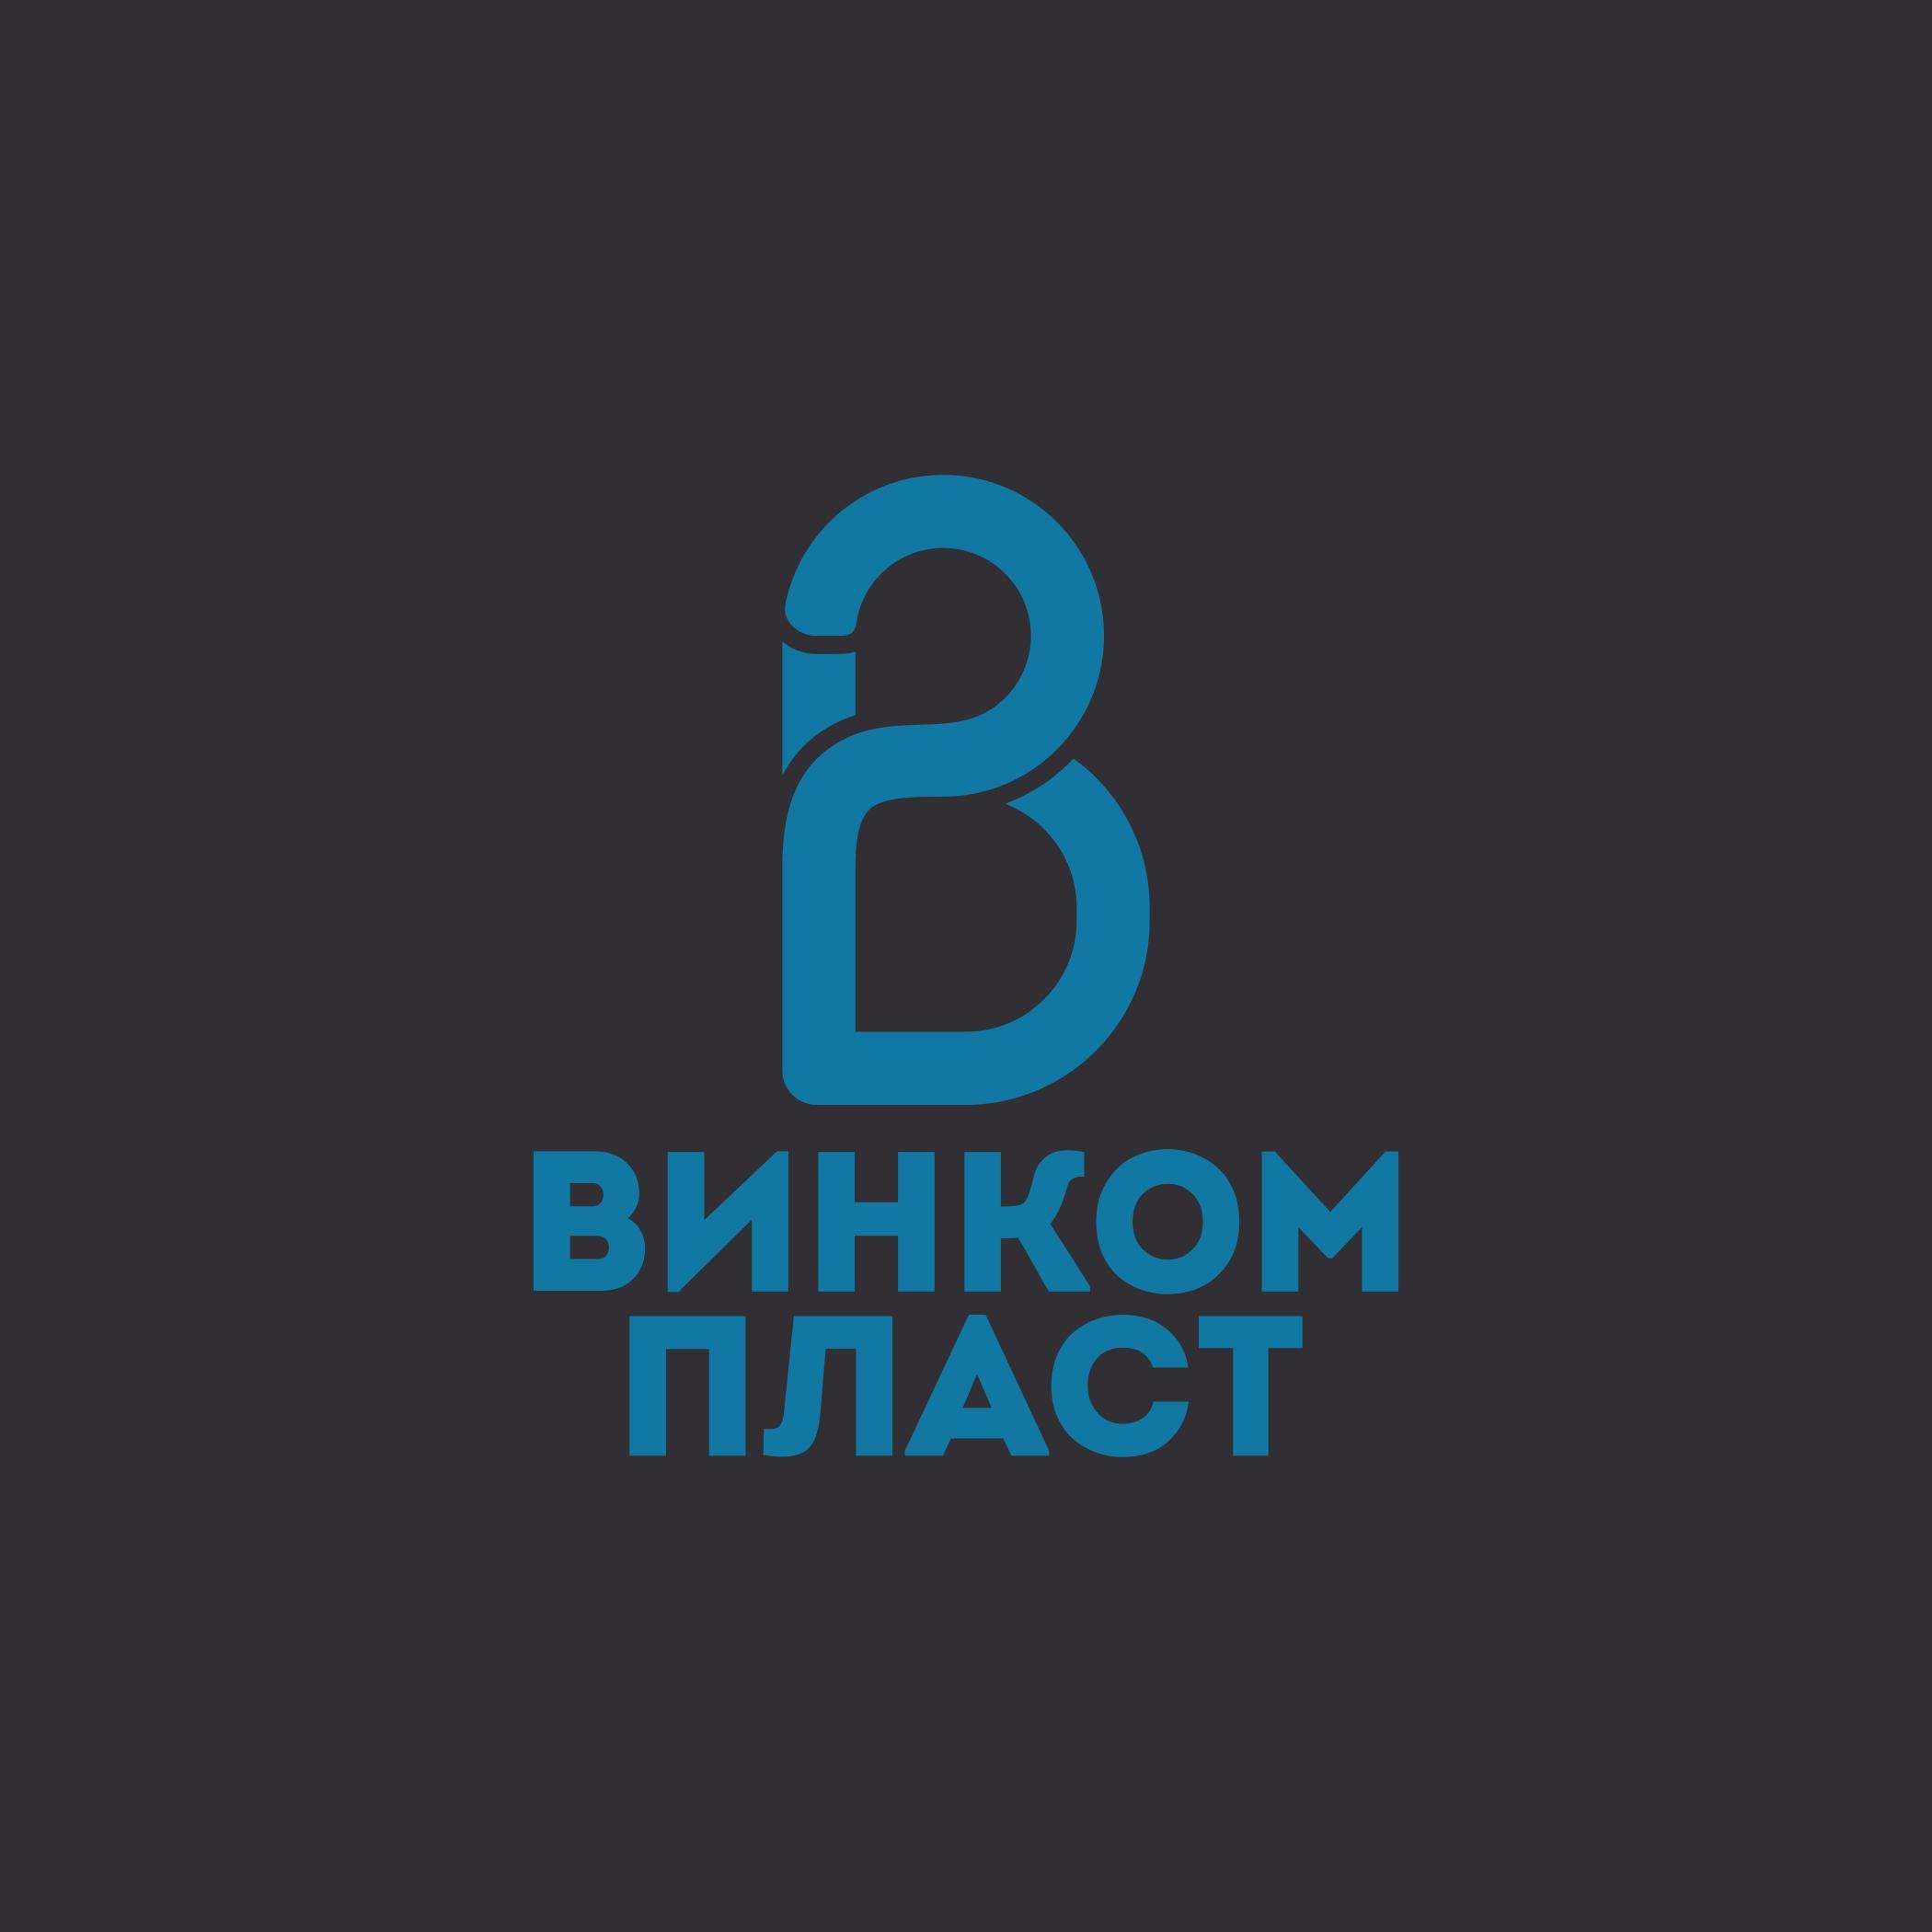 Логотип, фавикон и визитка для компании Винком Пласт  фото f_1525c458e9426315.jpg